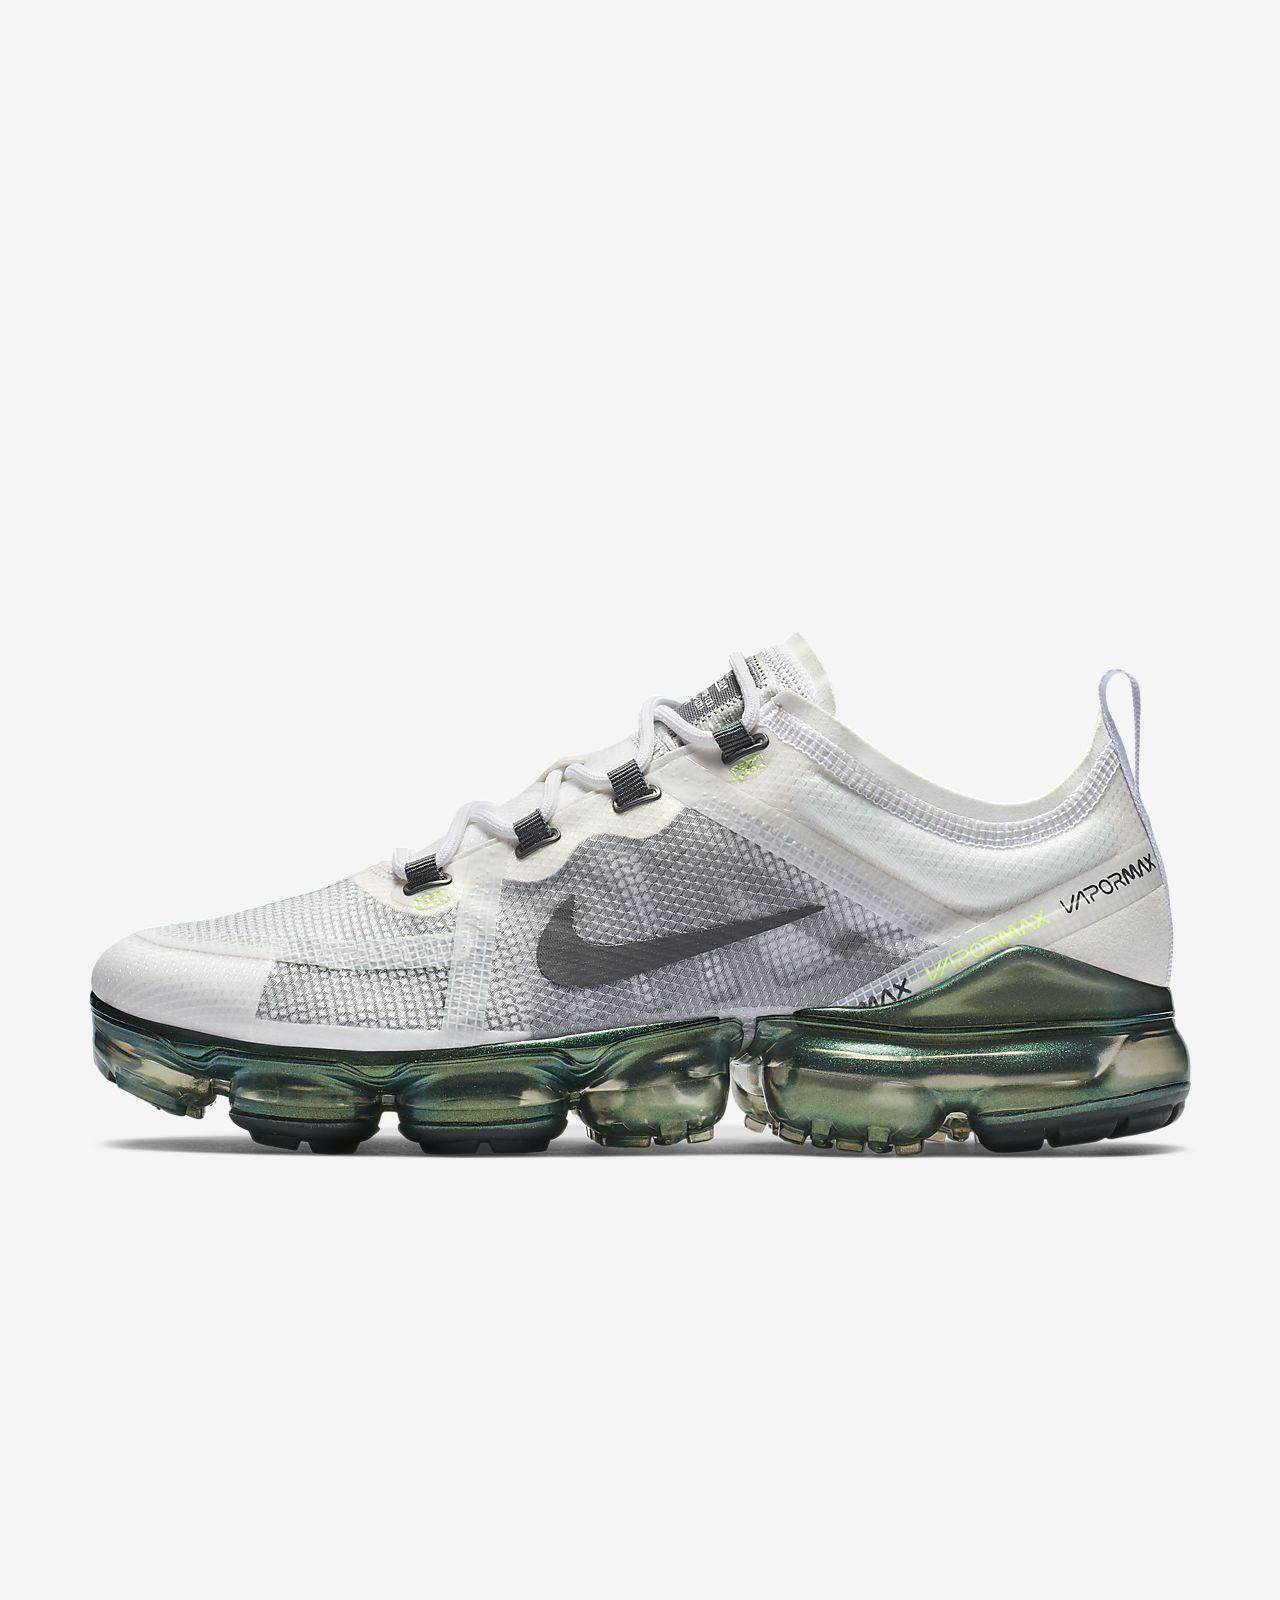 2nike uomo scarpe 2019 vapormax